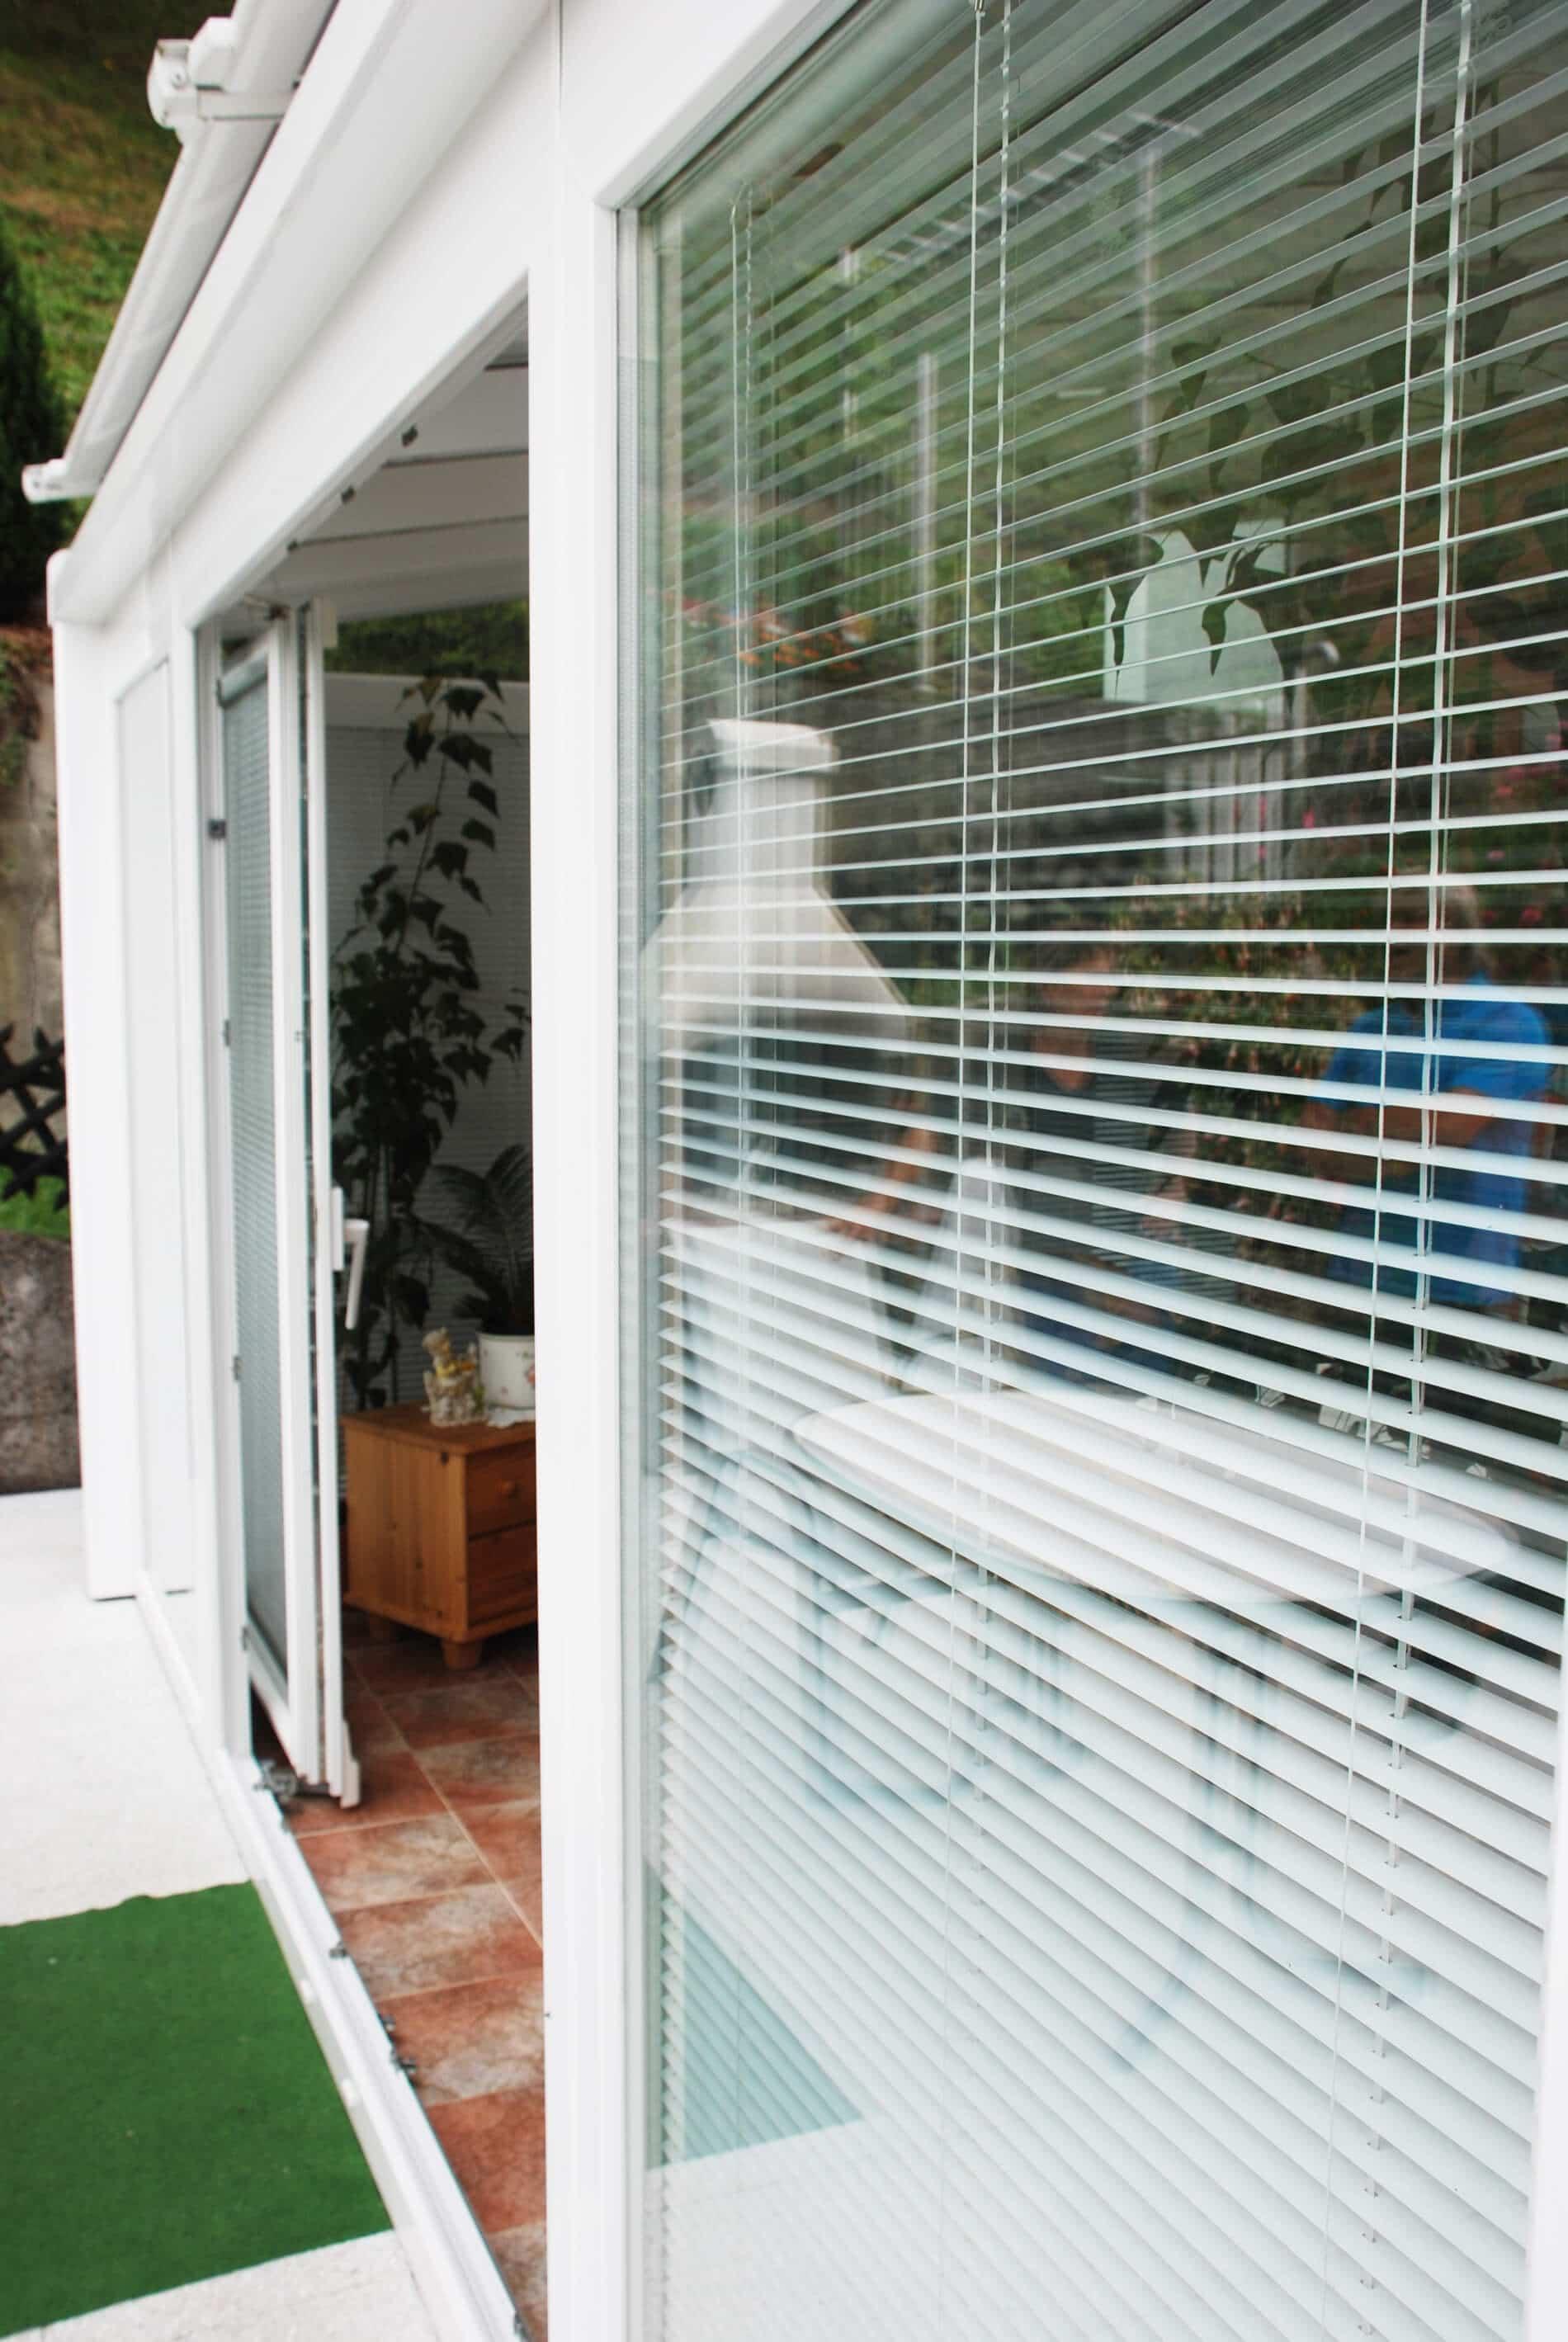 holz aluminium wintergarten mit schiebet ren wintergarten schmidinger. Black Bedroom Furniture Sets. Home Design Ideas